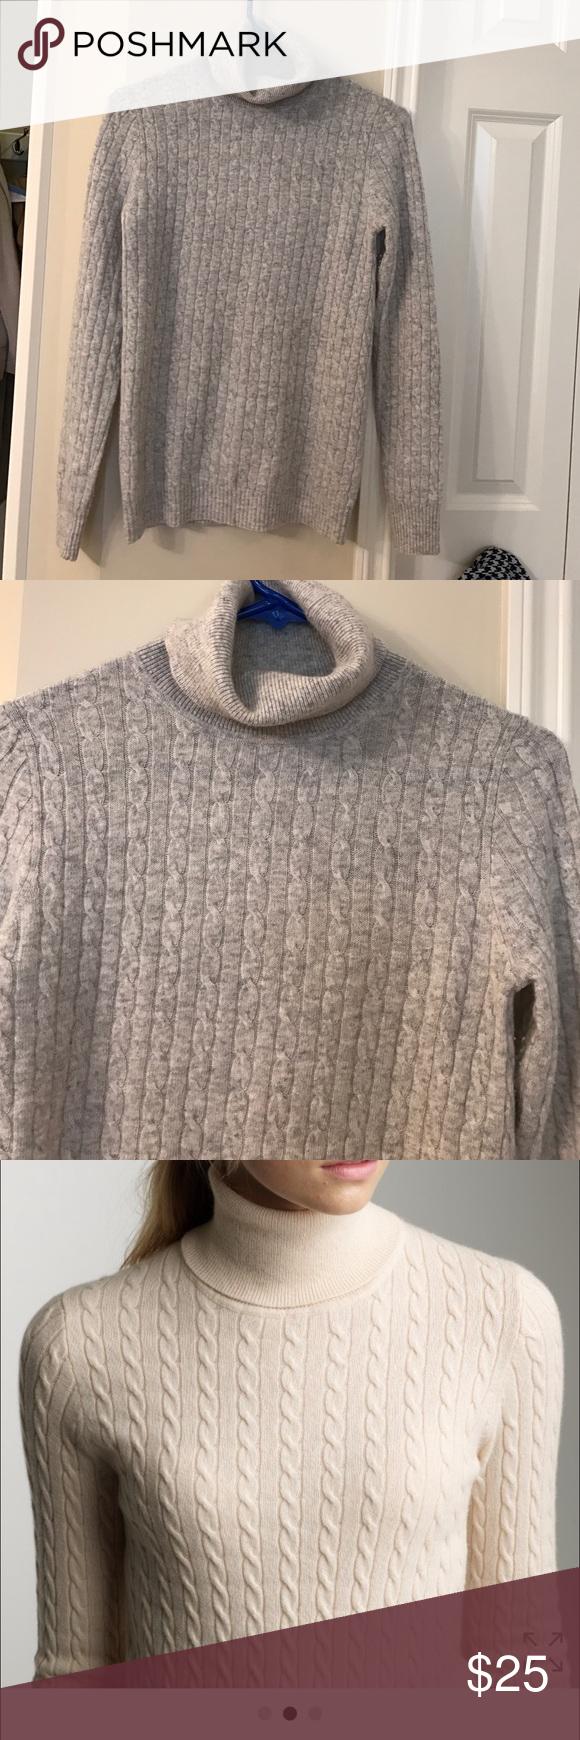 XS Light grey Cambridge turtleneck sweater. XS Light grey Cambridge turtleneck sweater. Beautiful condition. Worn once.  Wool nylon cashmere blend J. Crew Sweaters Cowl & Turtlenecks